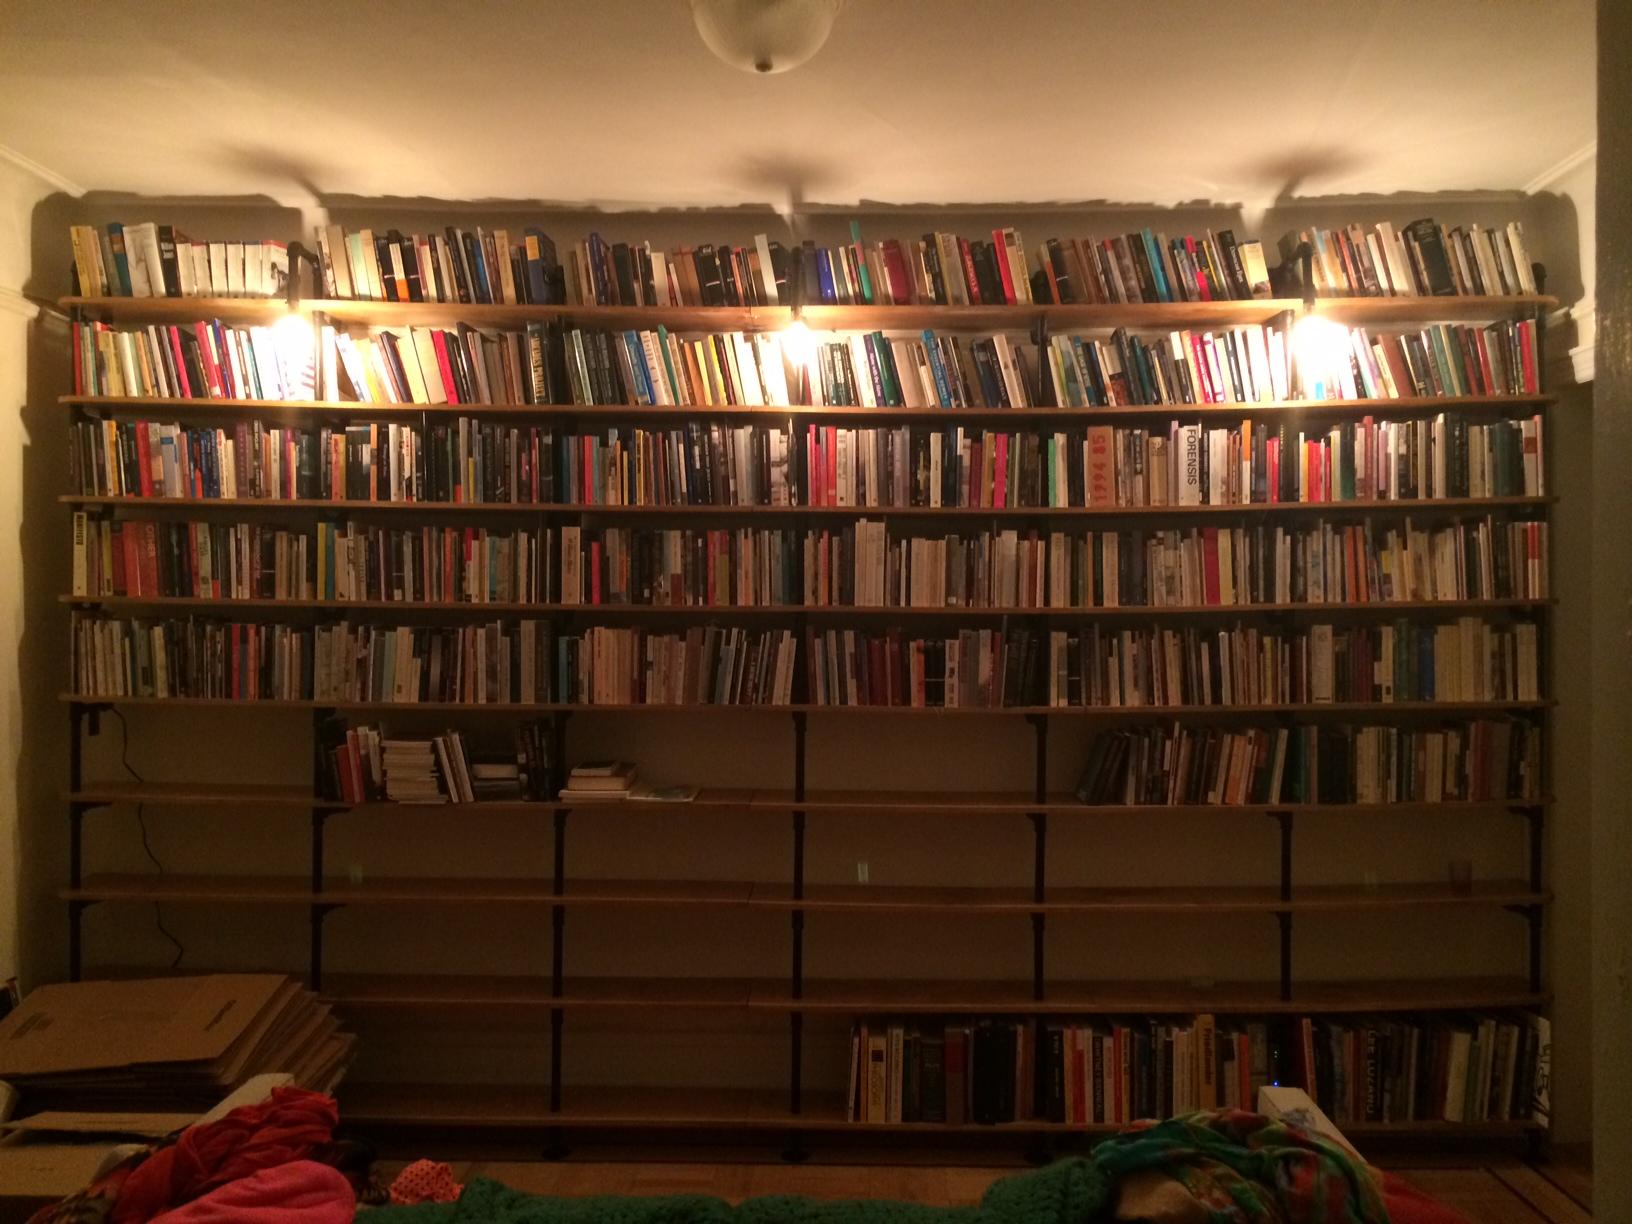 Donovan-Lasky Shelves 1.JPG